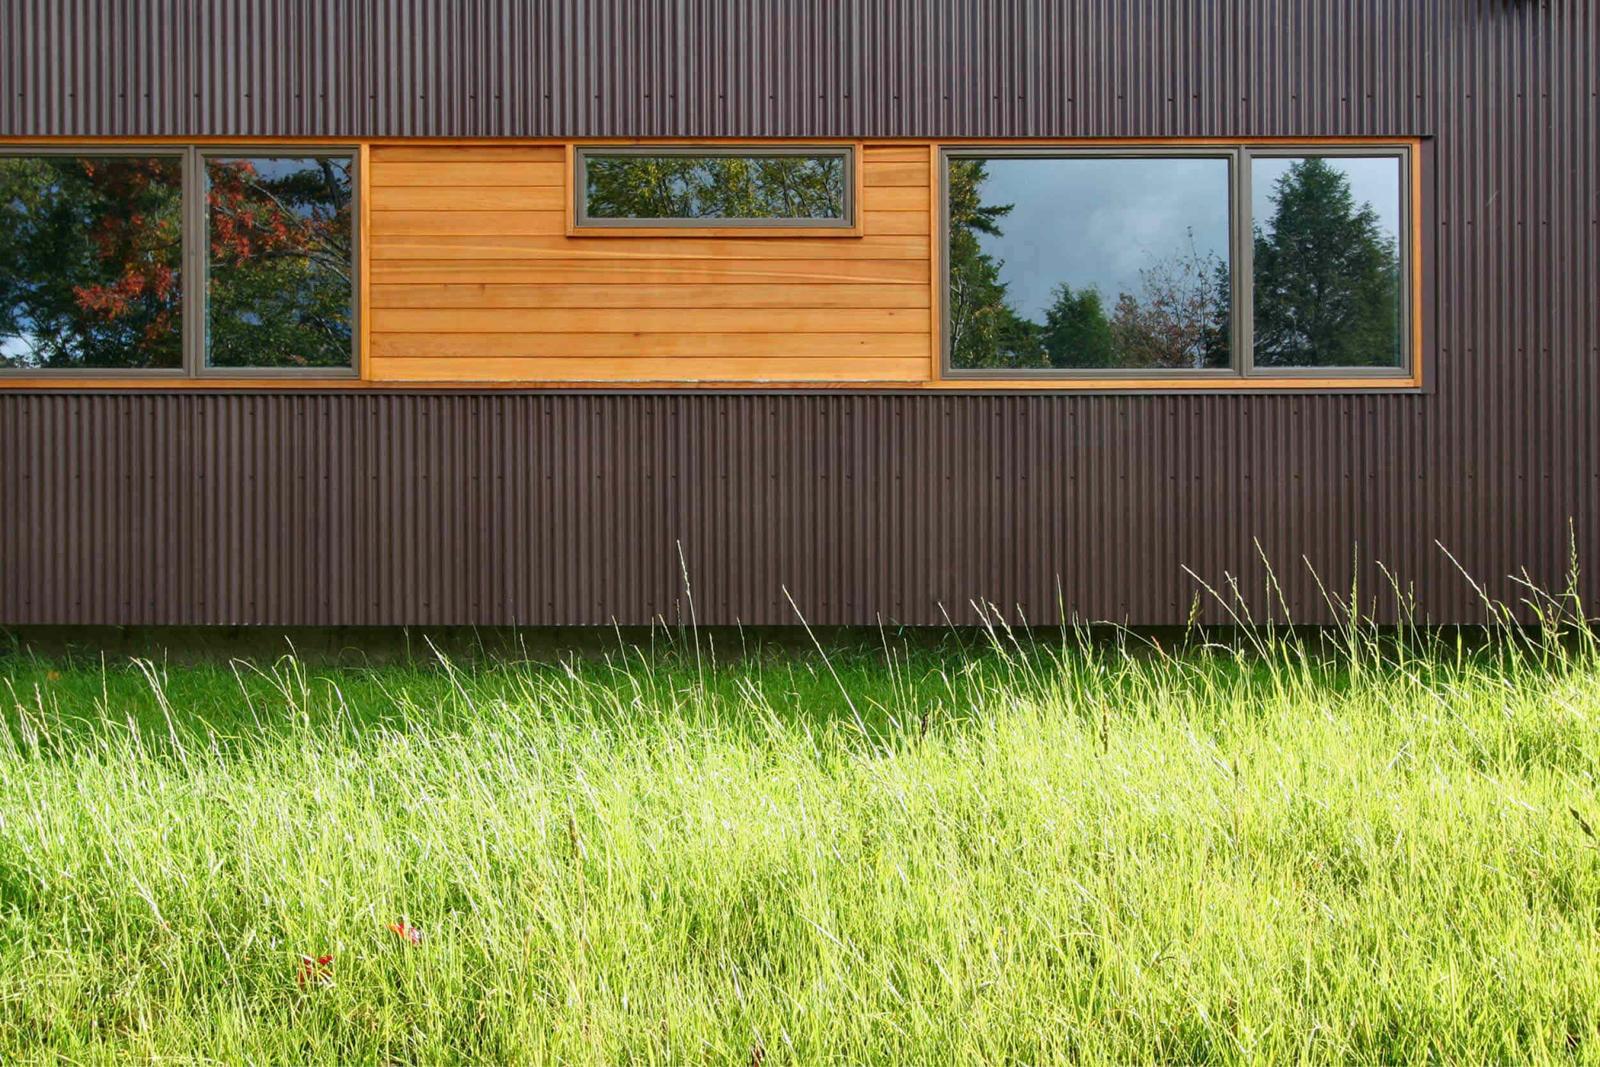 06-res4-resolution-4-architecture-modern-modular-home-prefab-house-vermont-cabin-exterior.jpg